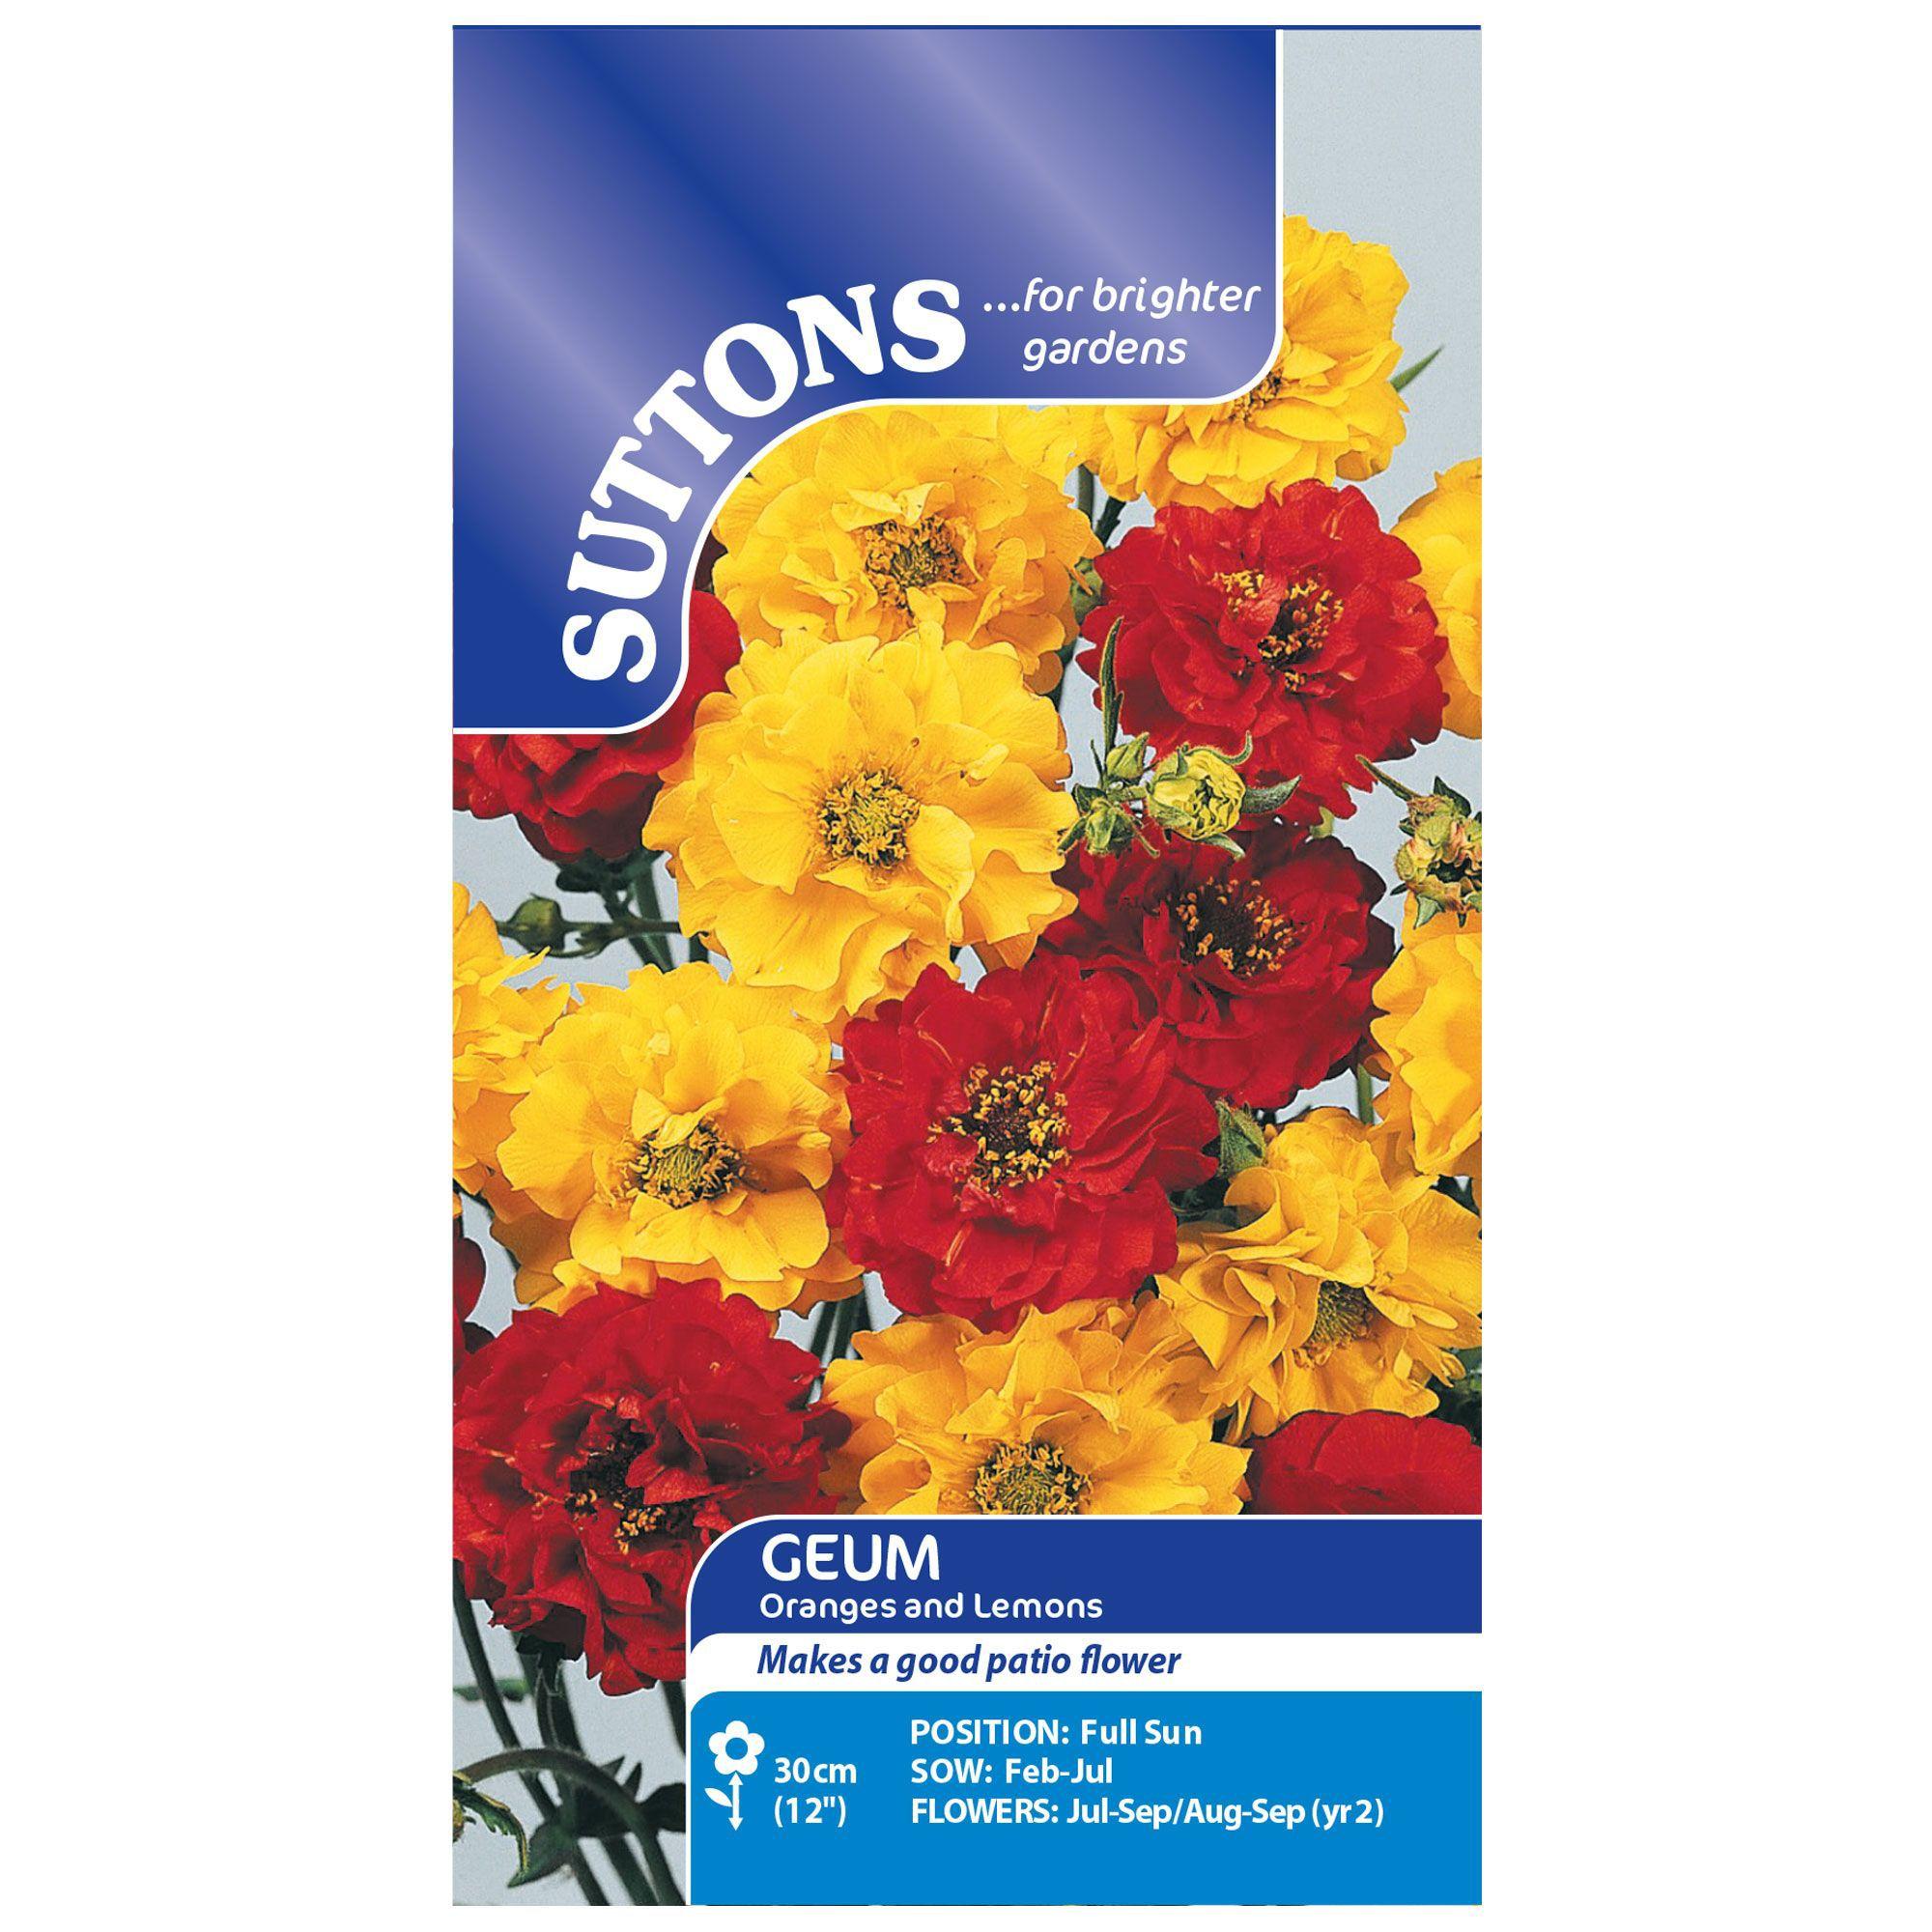 Suttons Geum Seeds, Oranges & lemons